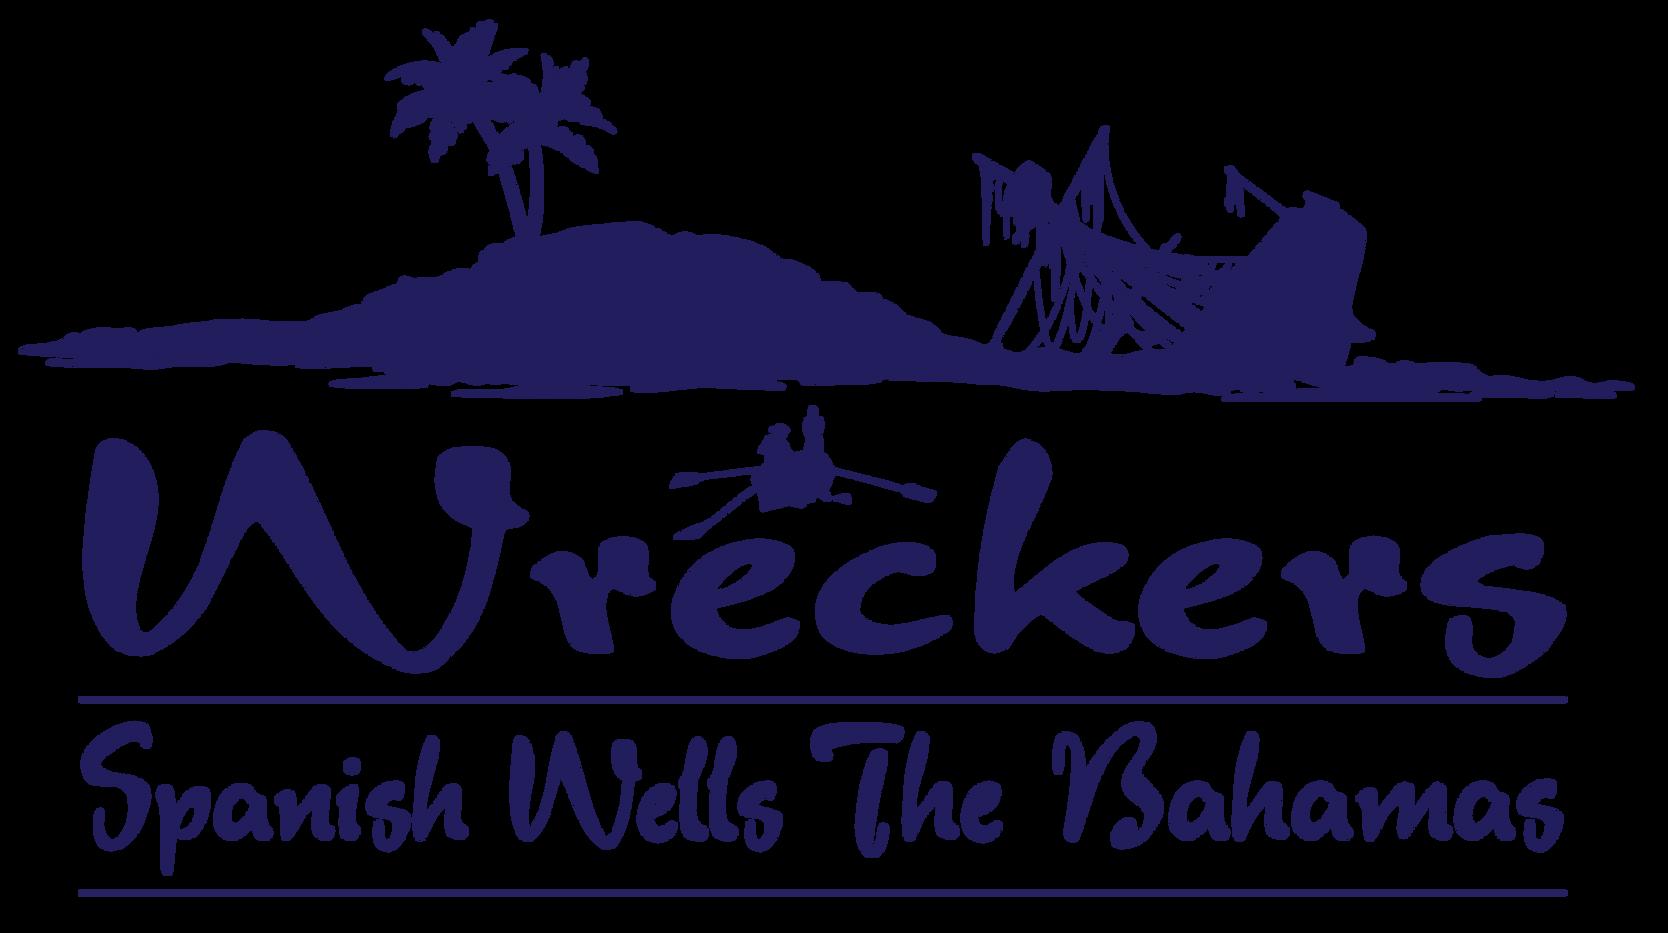 Wreckers logo - Nicole Collie